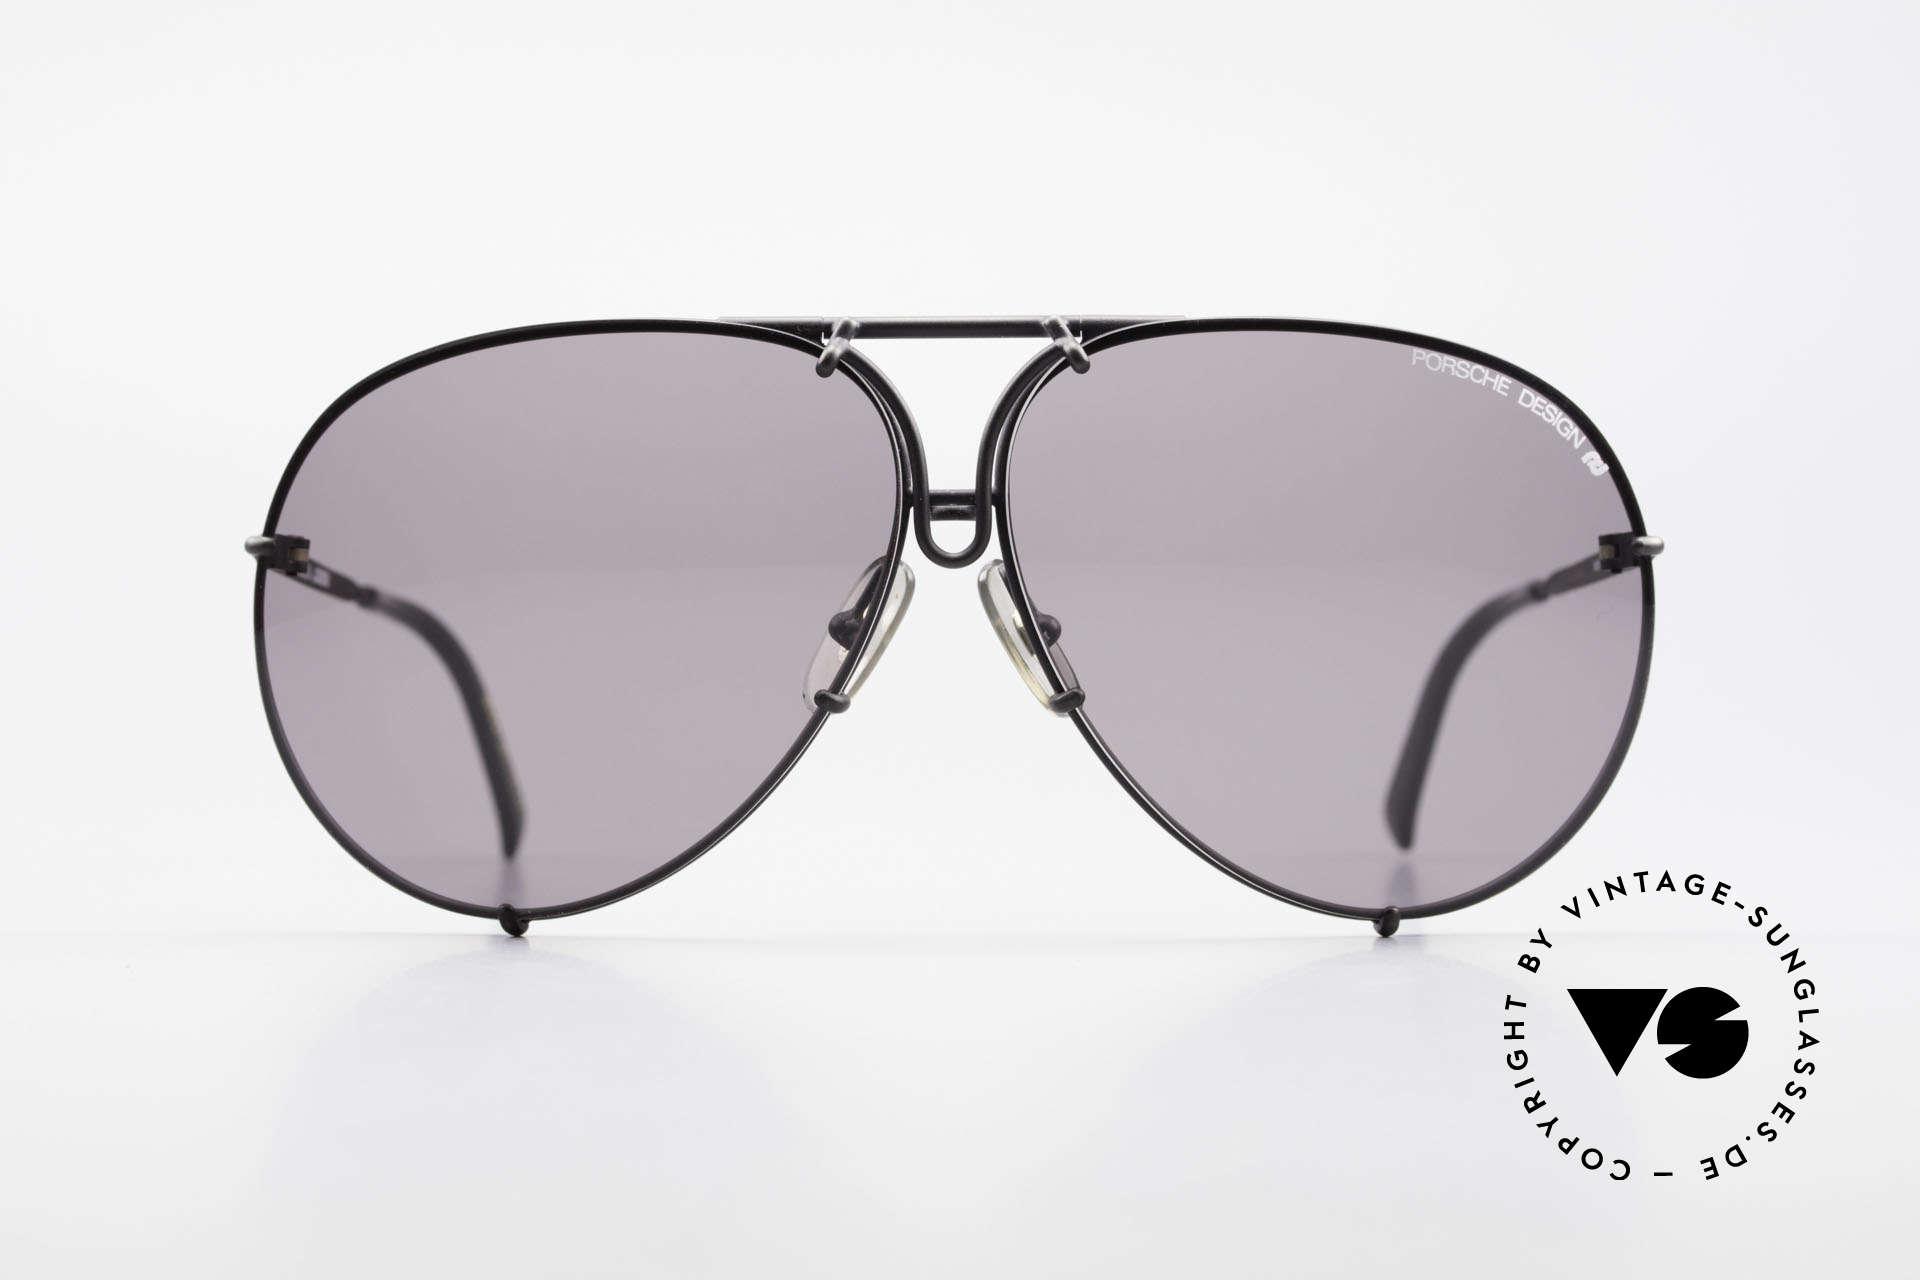 Porsche 5623 True 80's Aviator Sunglasses, unworn rarity incl. orig. PORSCHE DESIGN hard case, Made for Men and Women